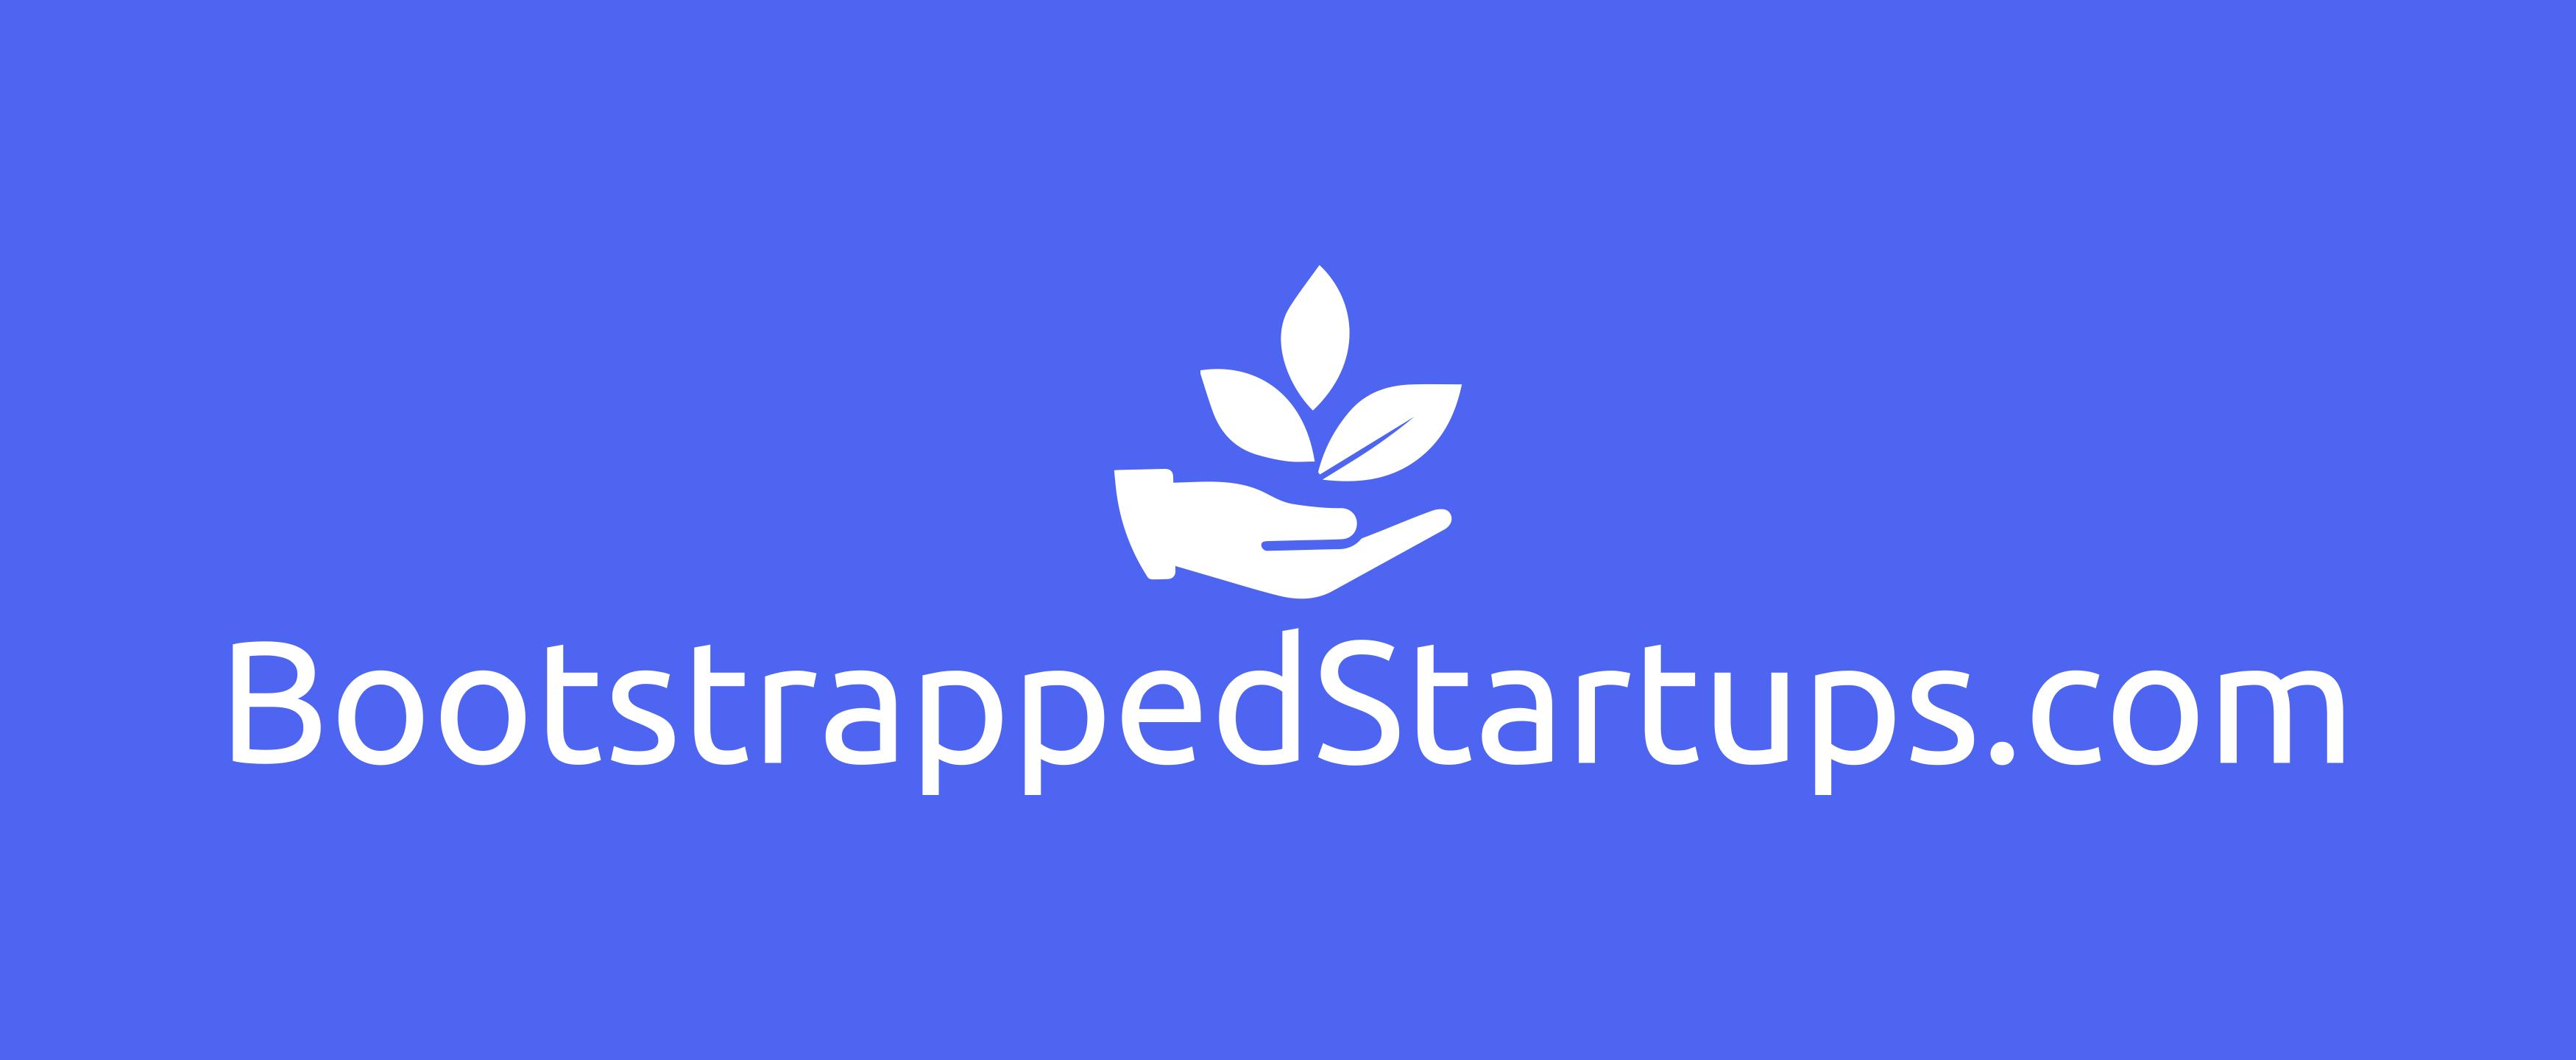 BootstrappedStartups.com